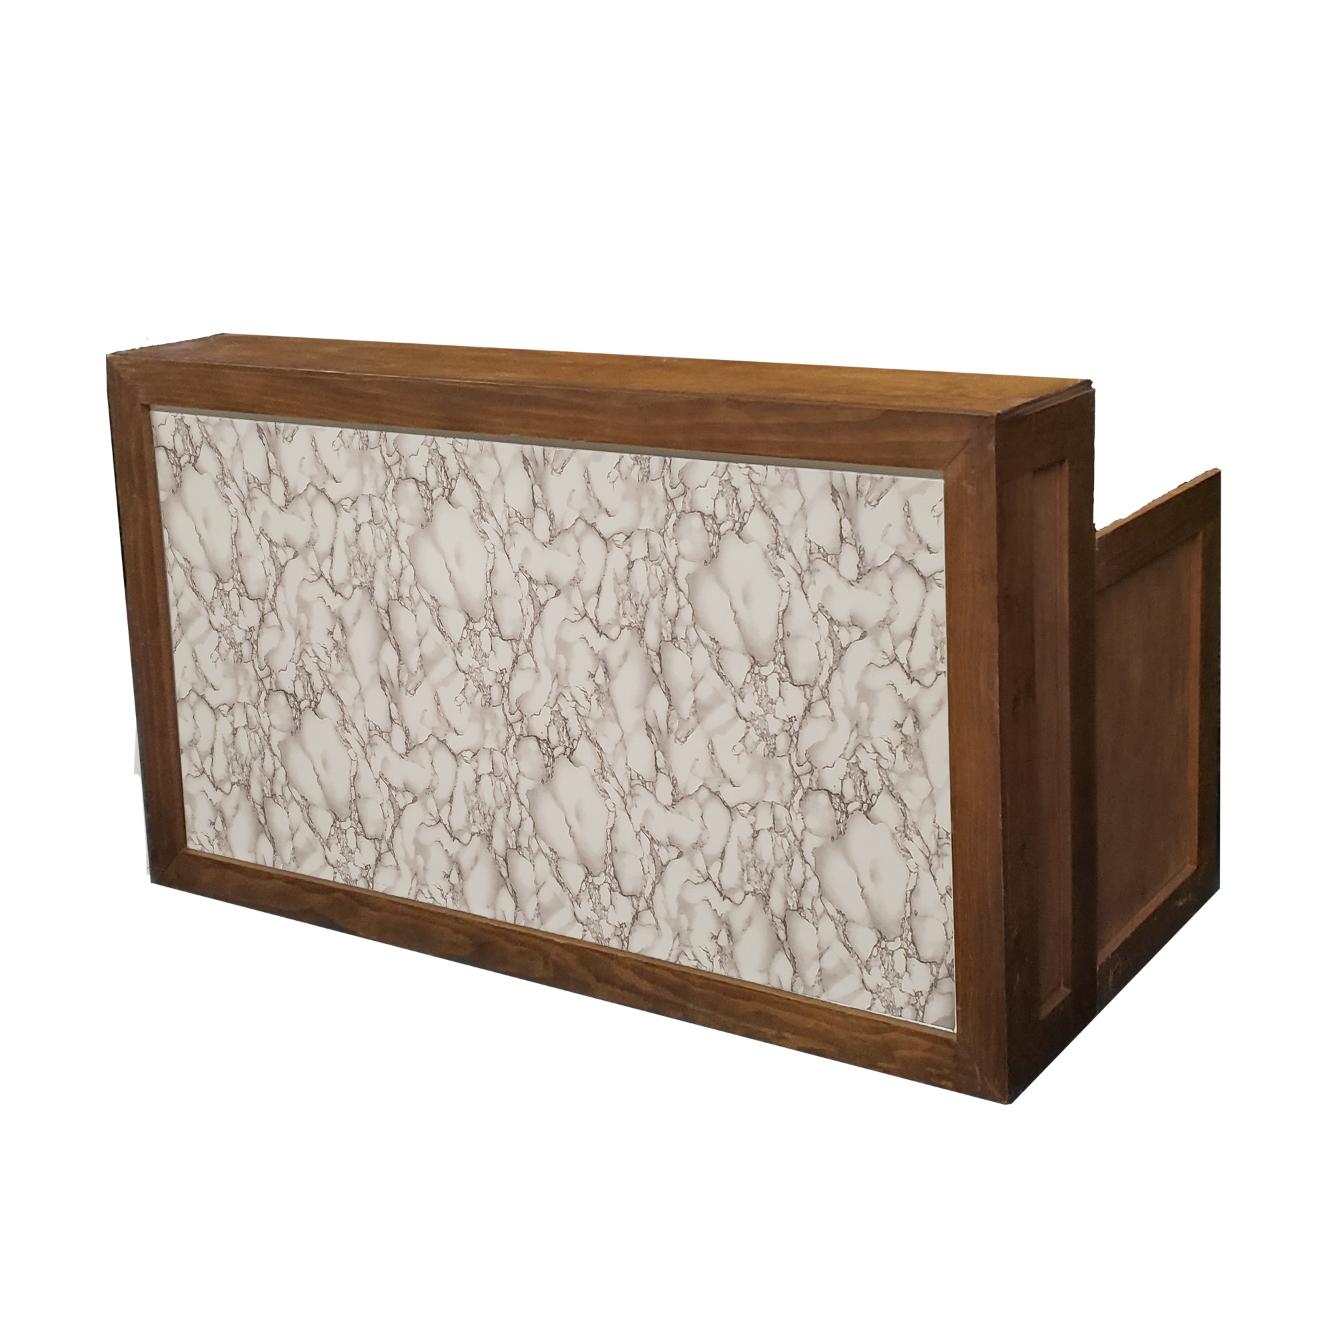 Wood Frame Bar/Marble Insert $200